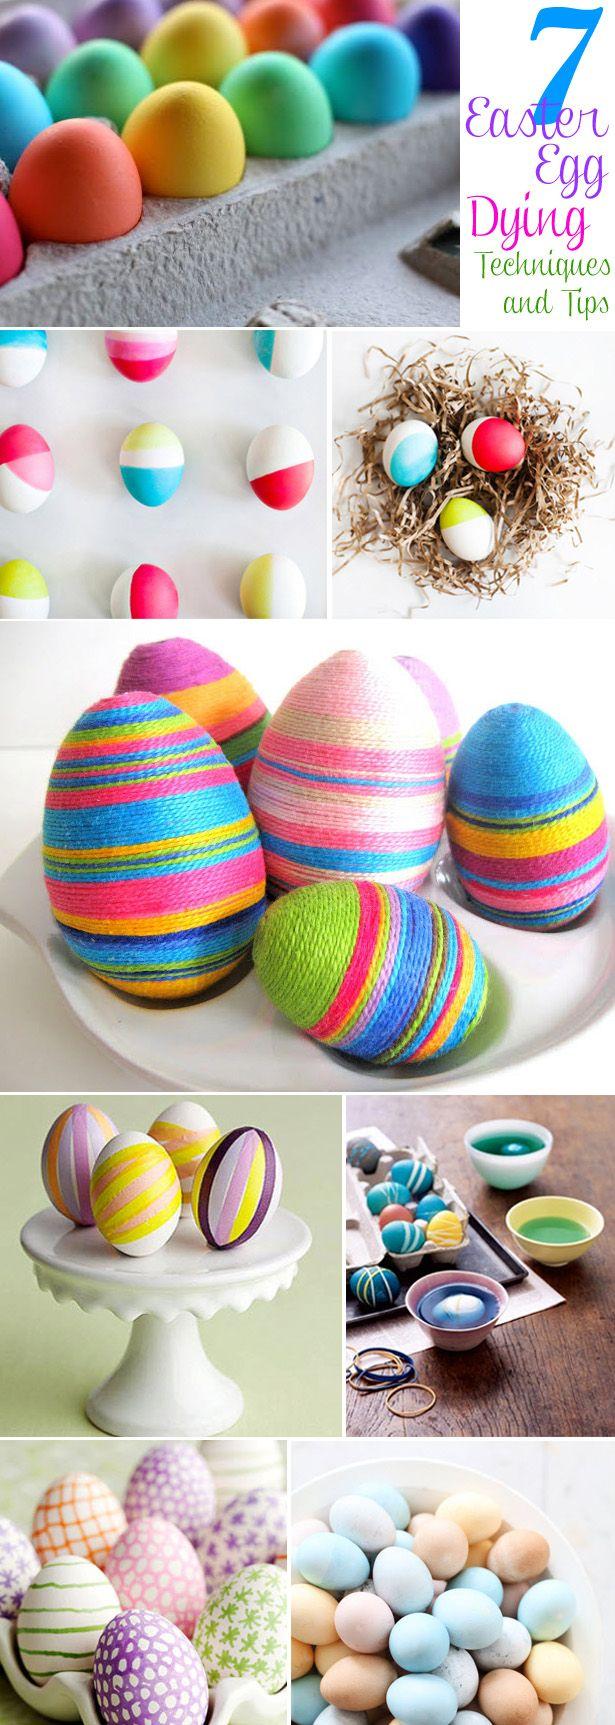 7 easter egg dyeing techniques best party ideas easter easter eggs easter egg dye. Black Bedroom Furniture Sets. Home Design Ideas